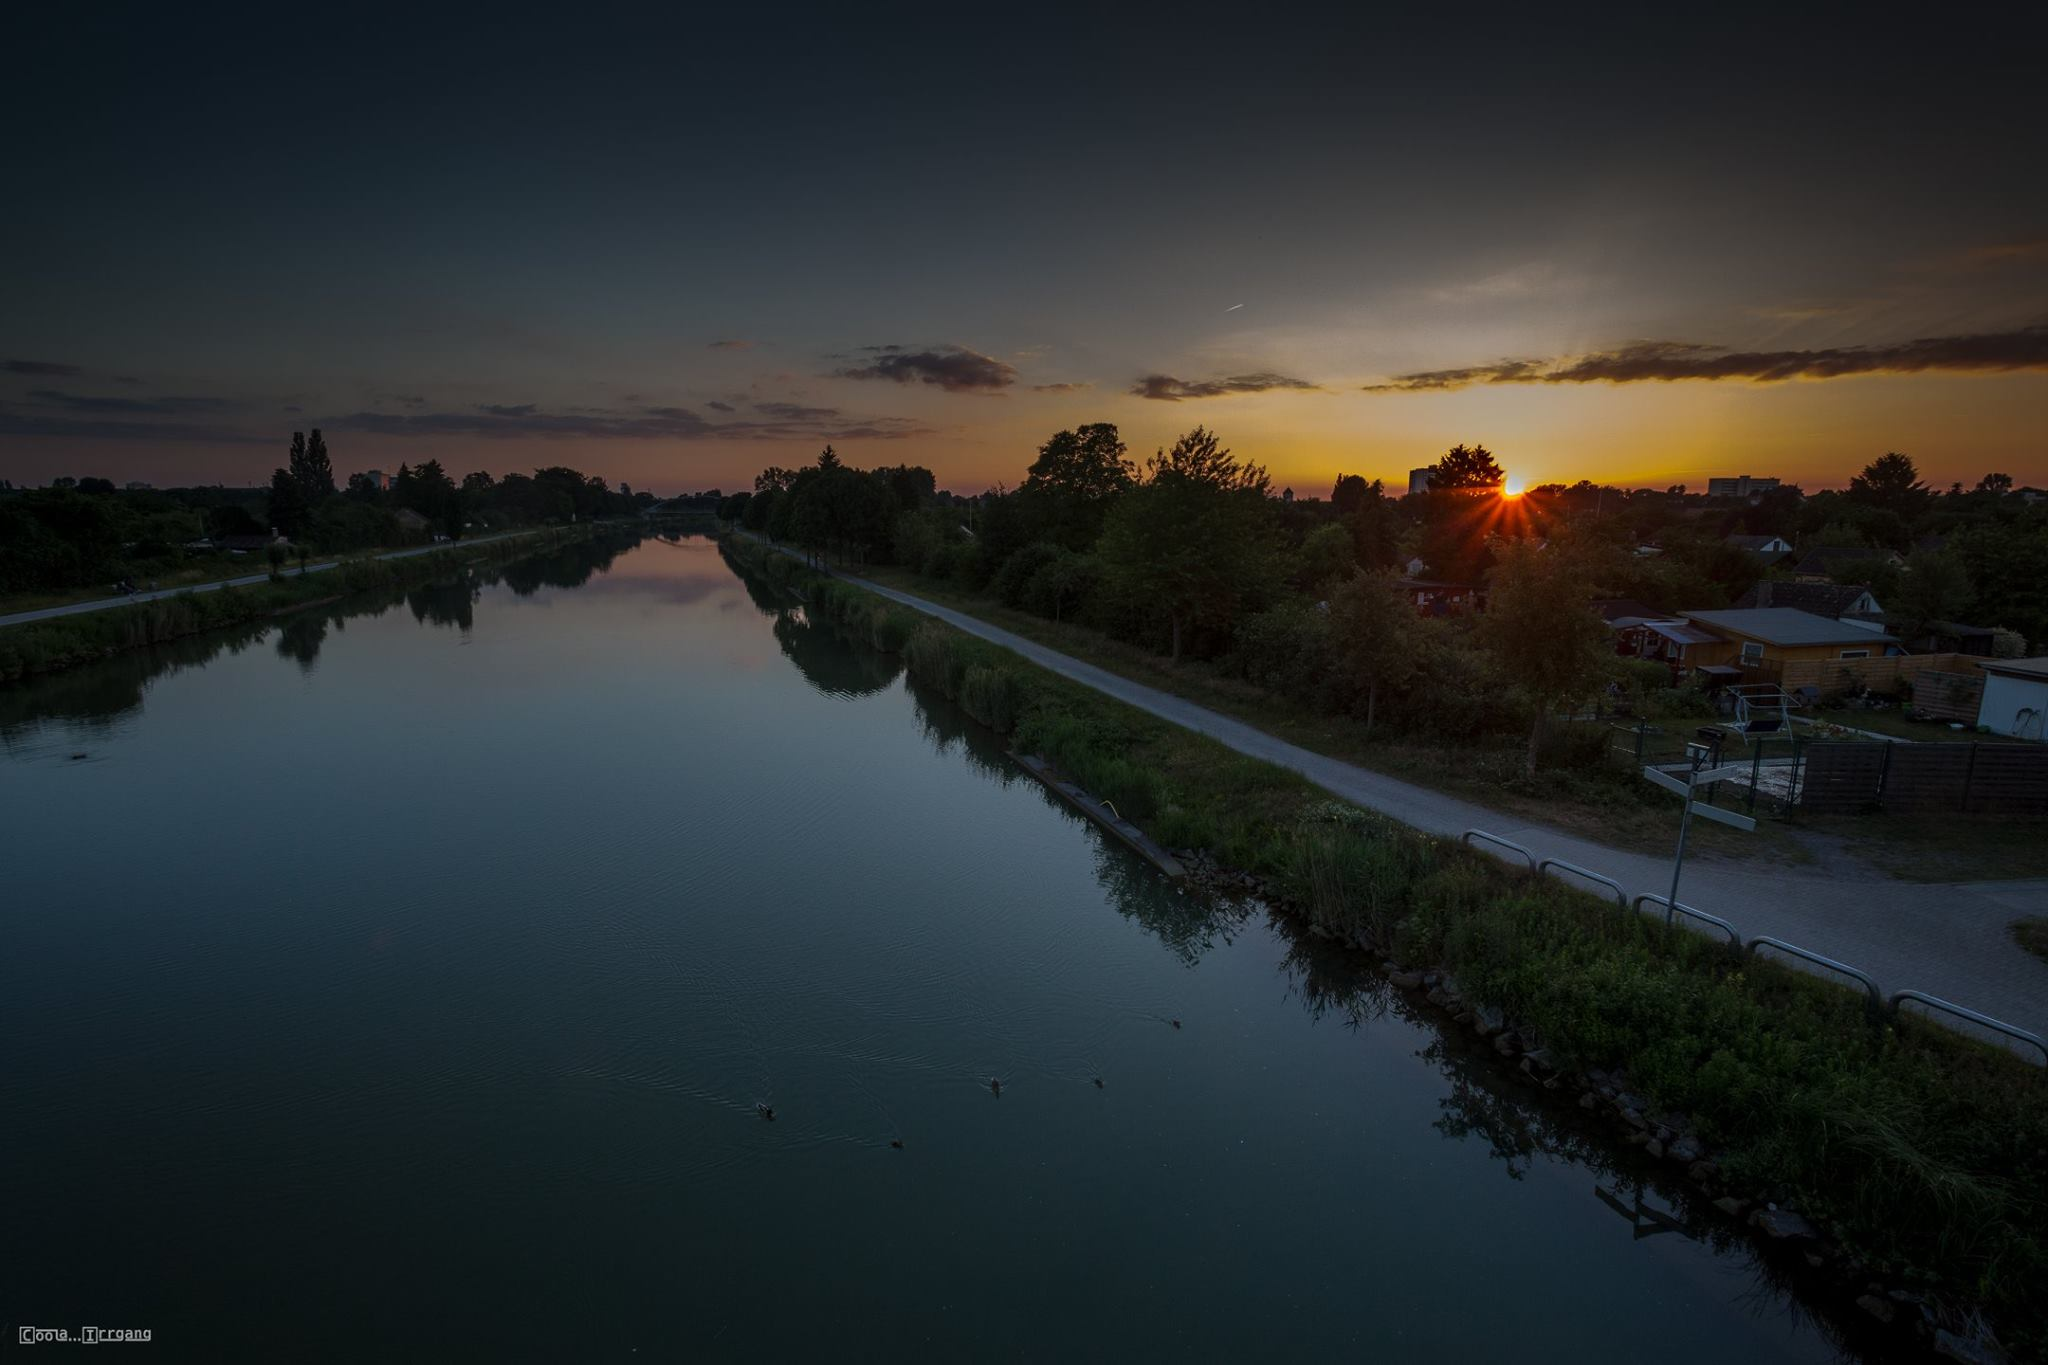 Sonnenuntergang am Mittellandkanal Hannover